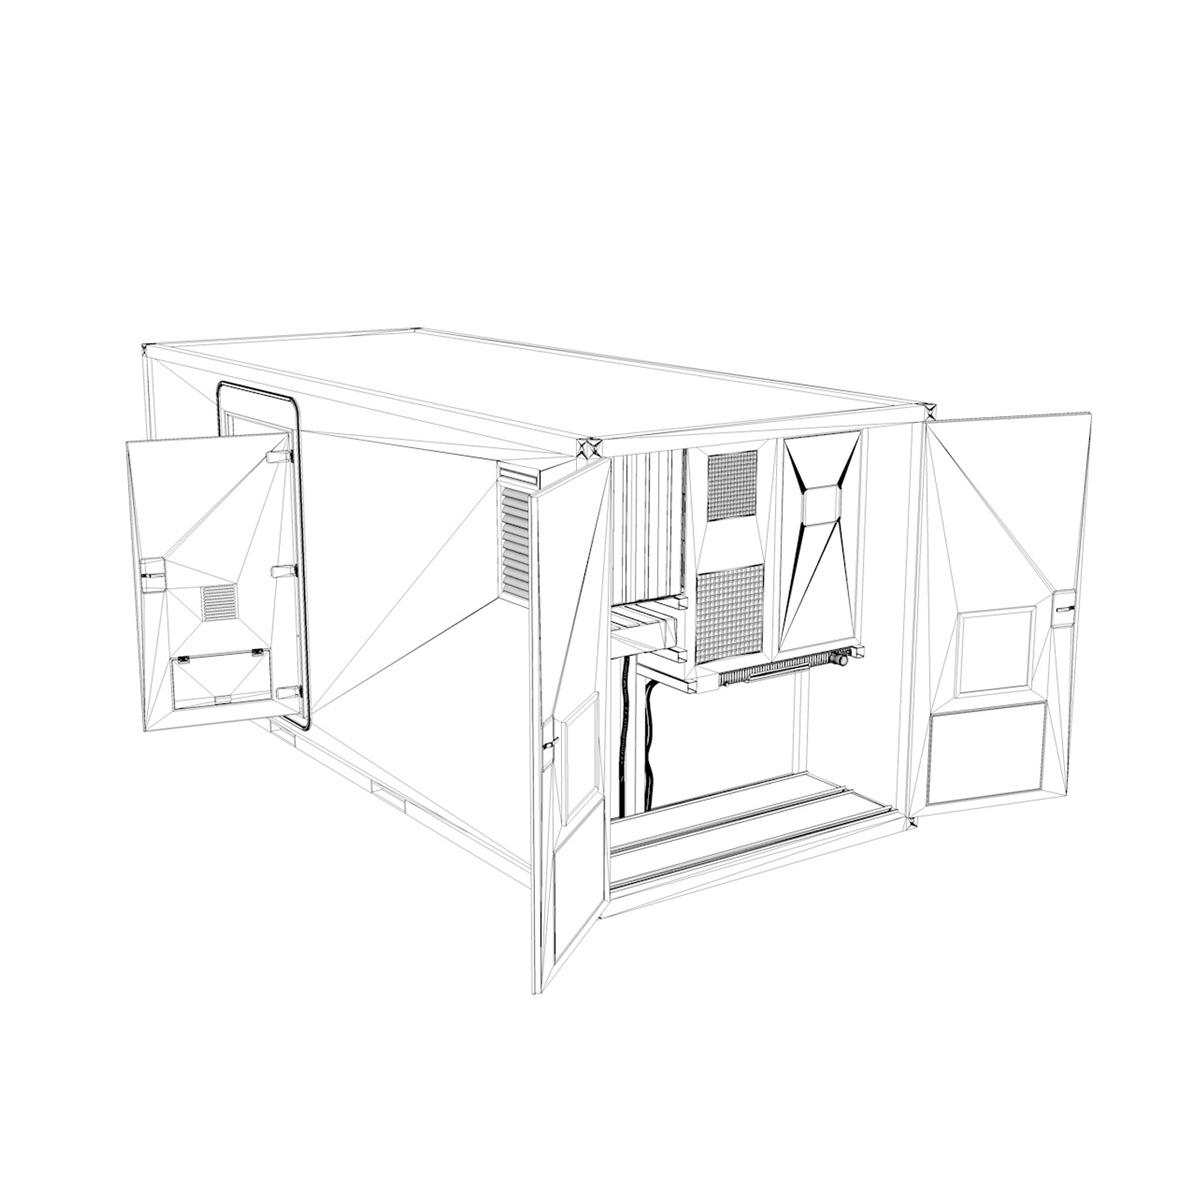 20ft office container version three 3d model 3ds fbx c4d lwo obj 252289